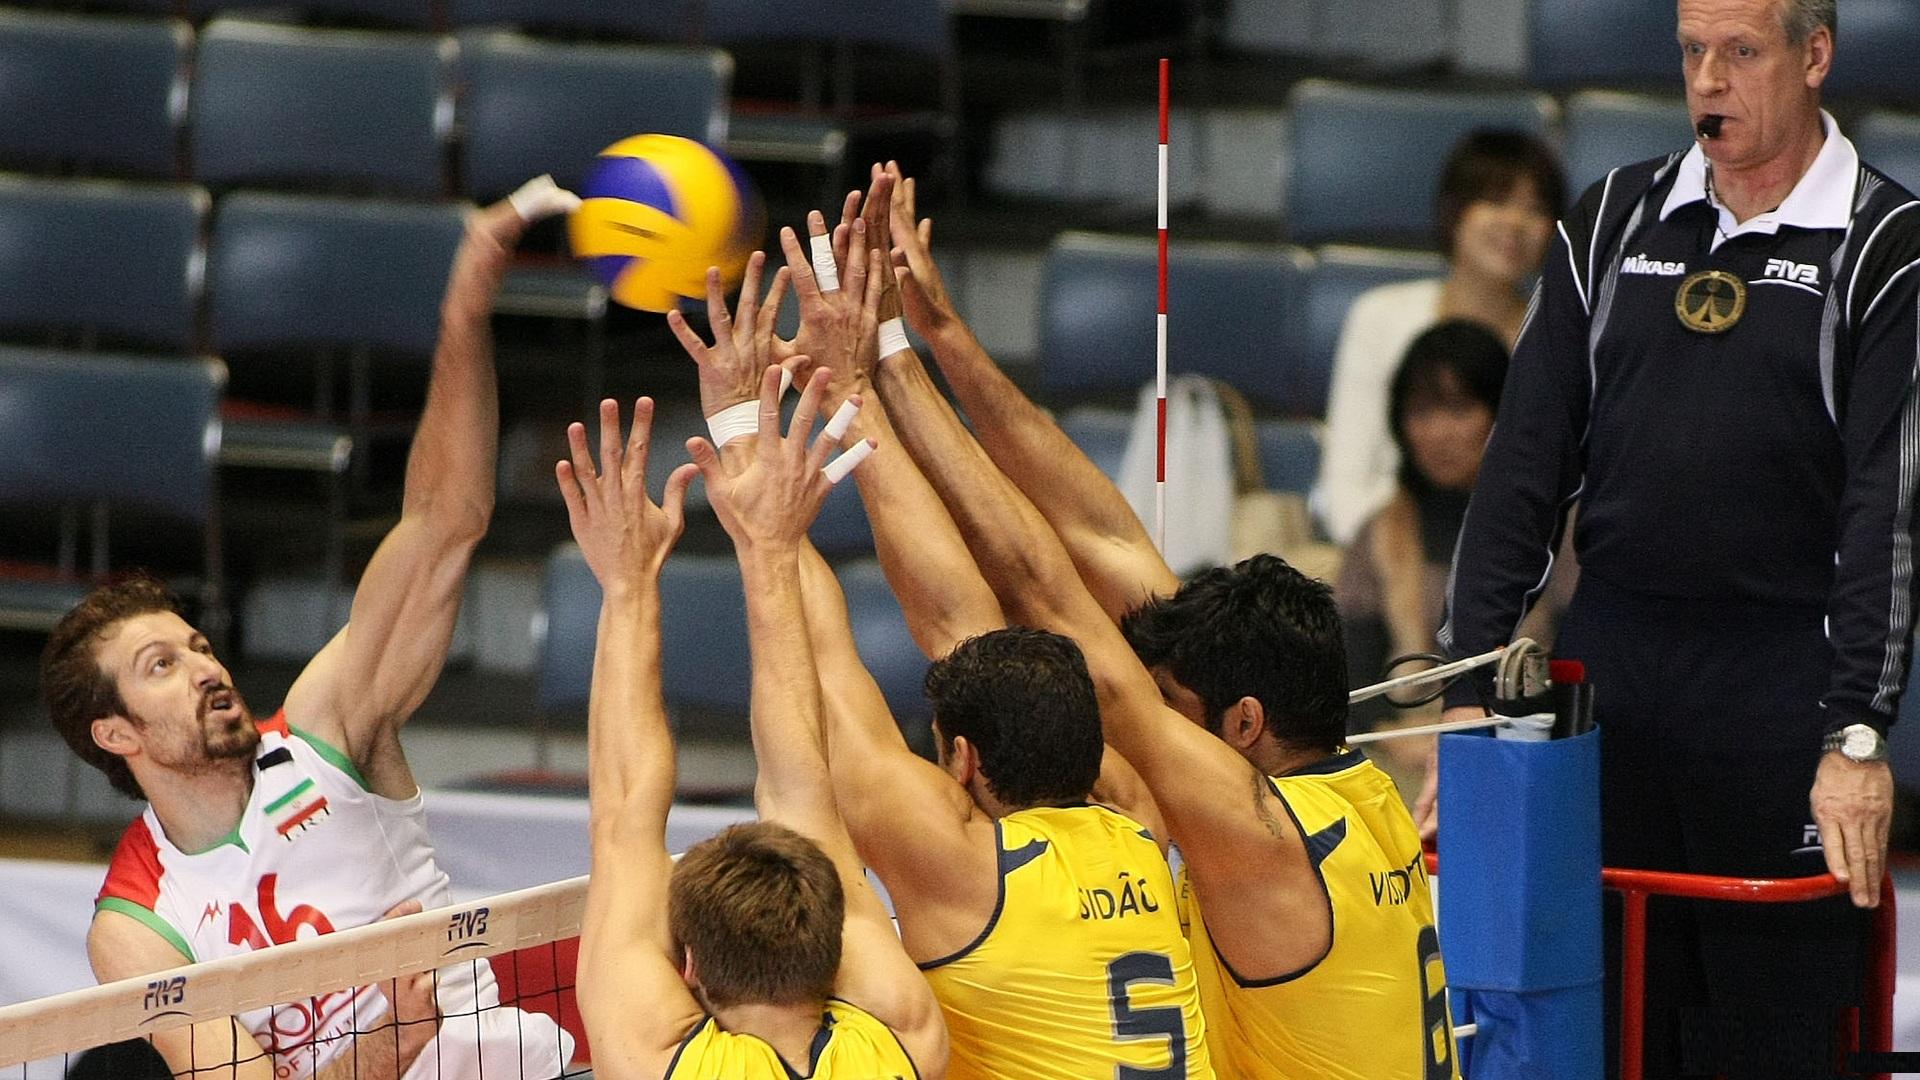 Wallpaper Volleyball Quotes Volleyball Wallpapers Hd Pixelstalk Net